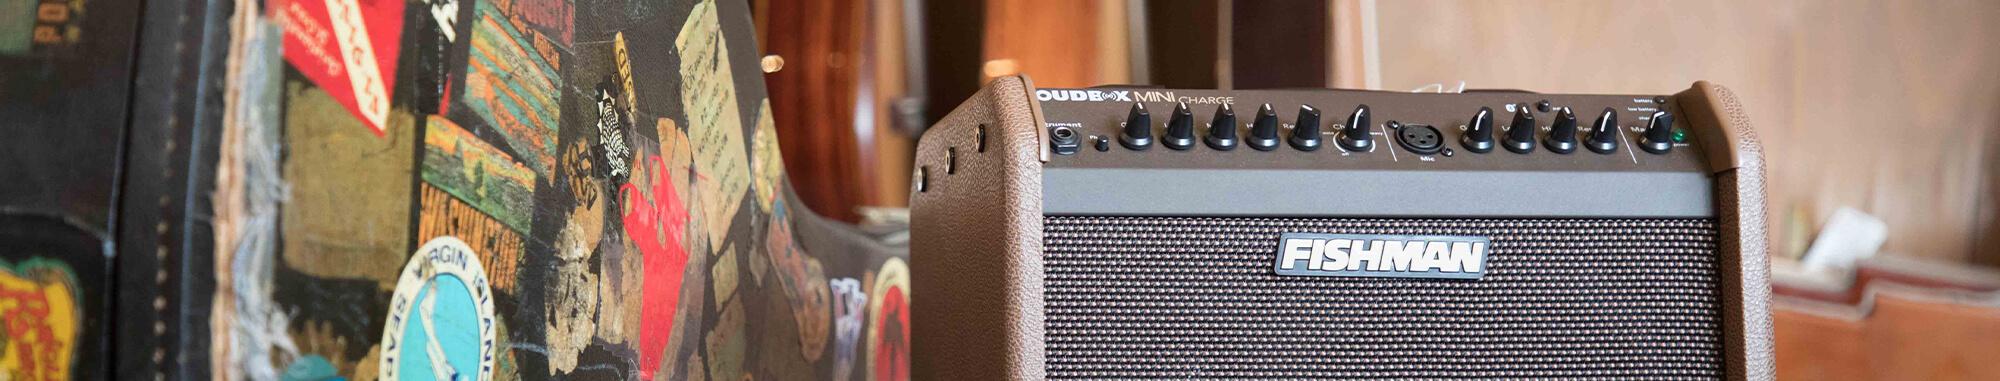 Fishman Loudbox Mini Charge acoustic amplifier next to an acoustic guitar case